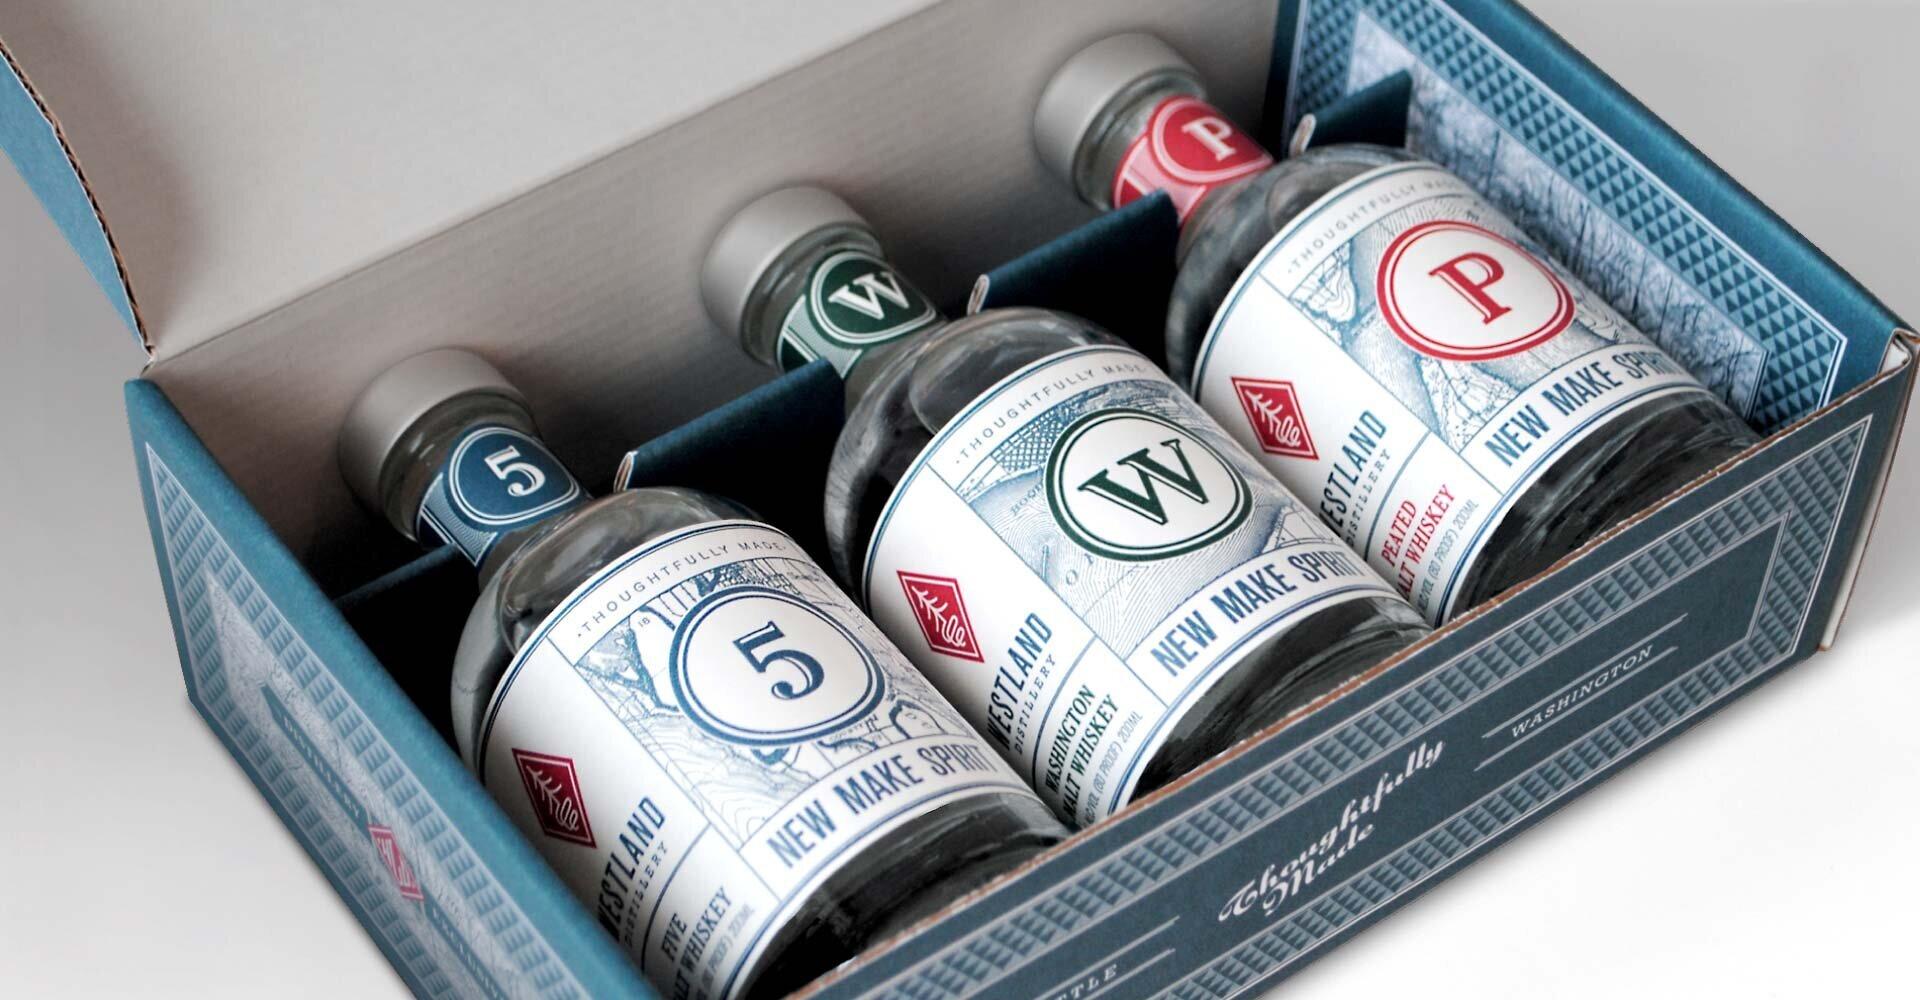 Westland Distillery's Alcohol To-Go Box